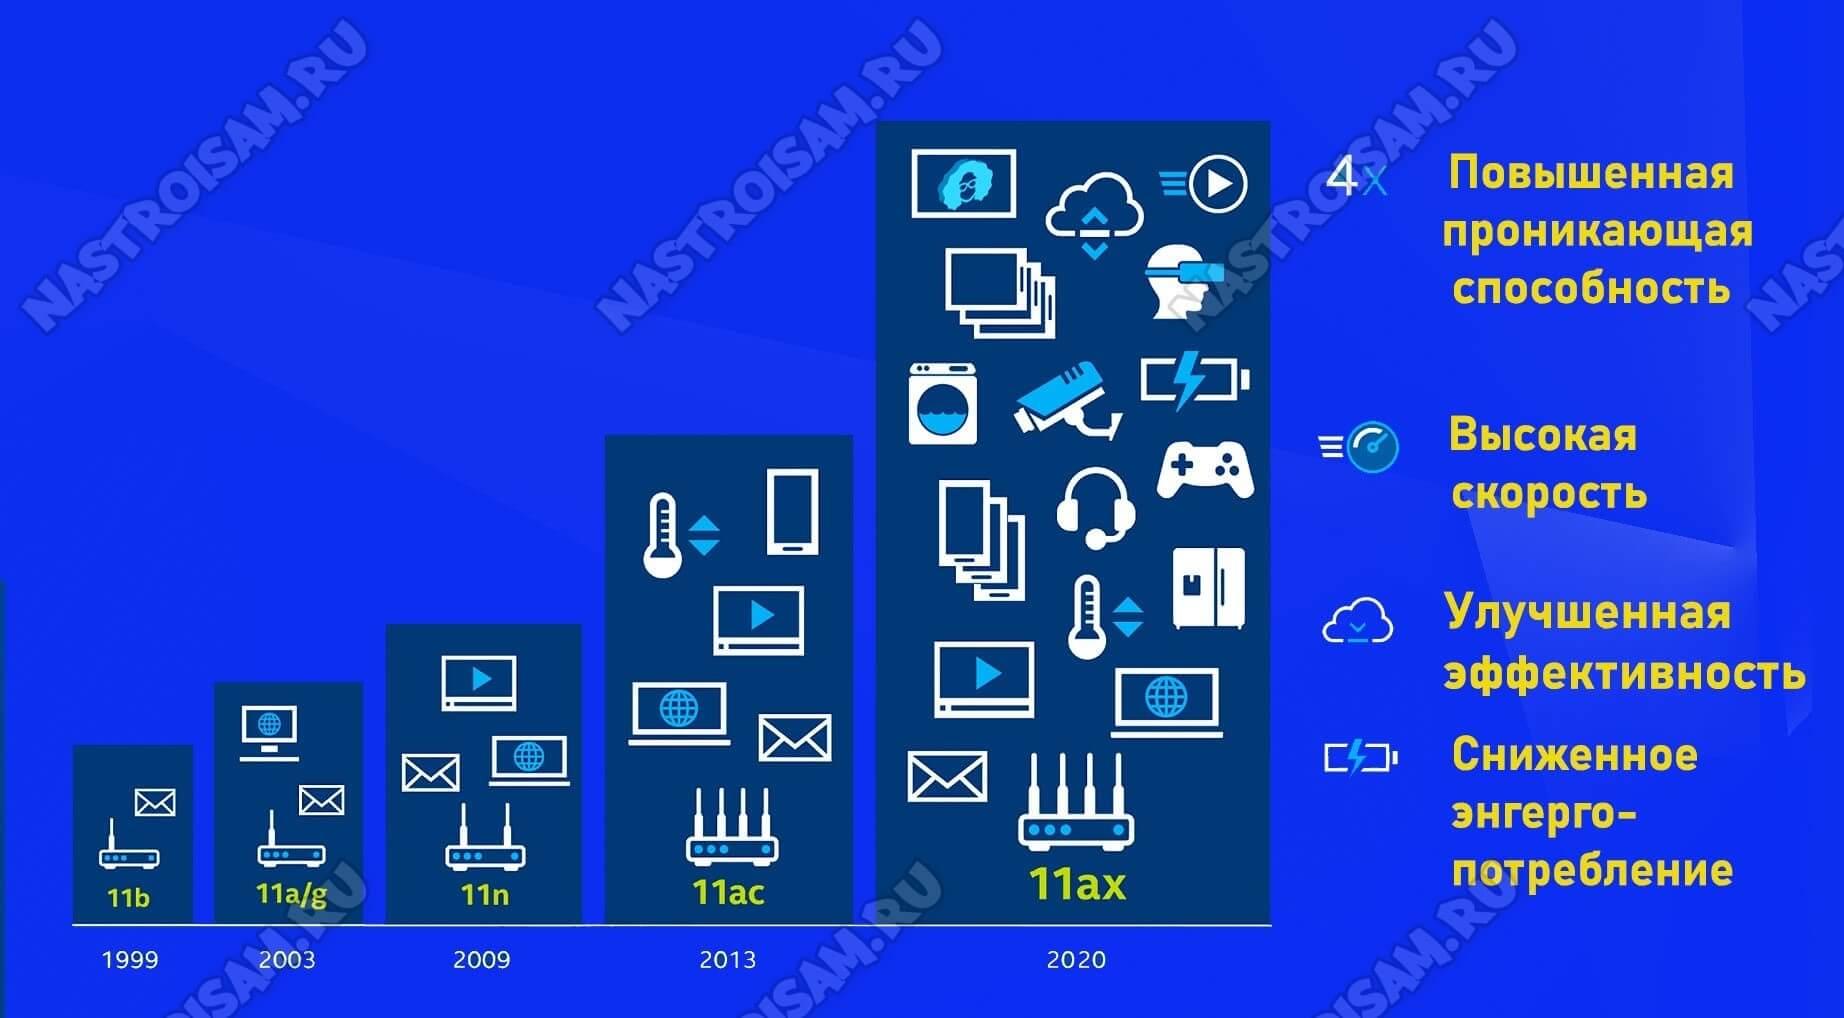 стандарт wi-fi 802.11 ax